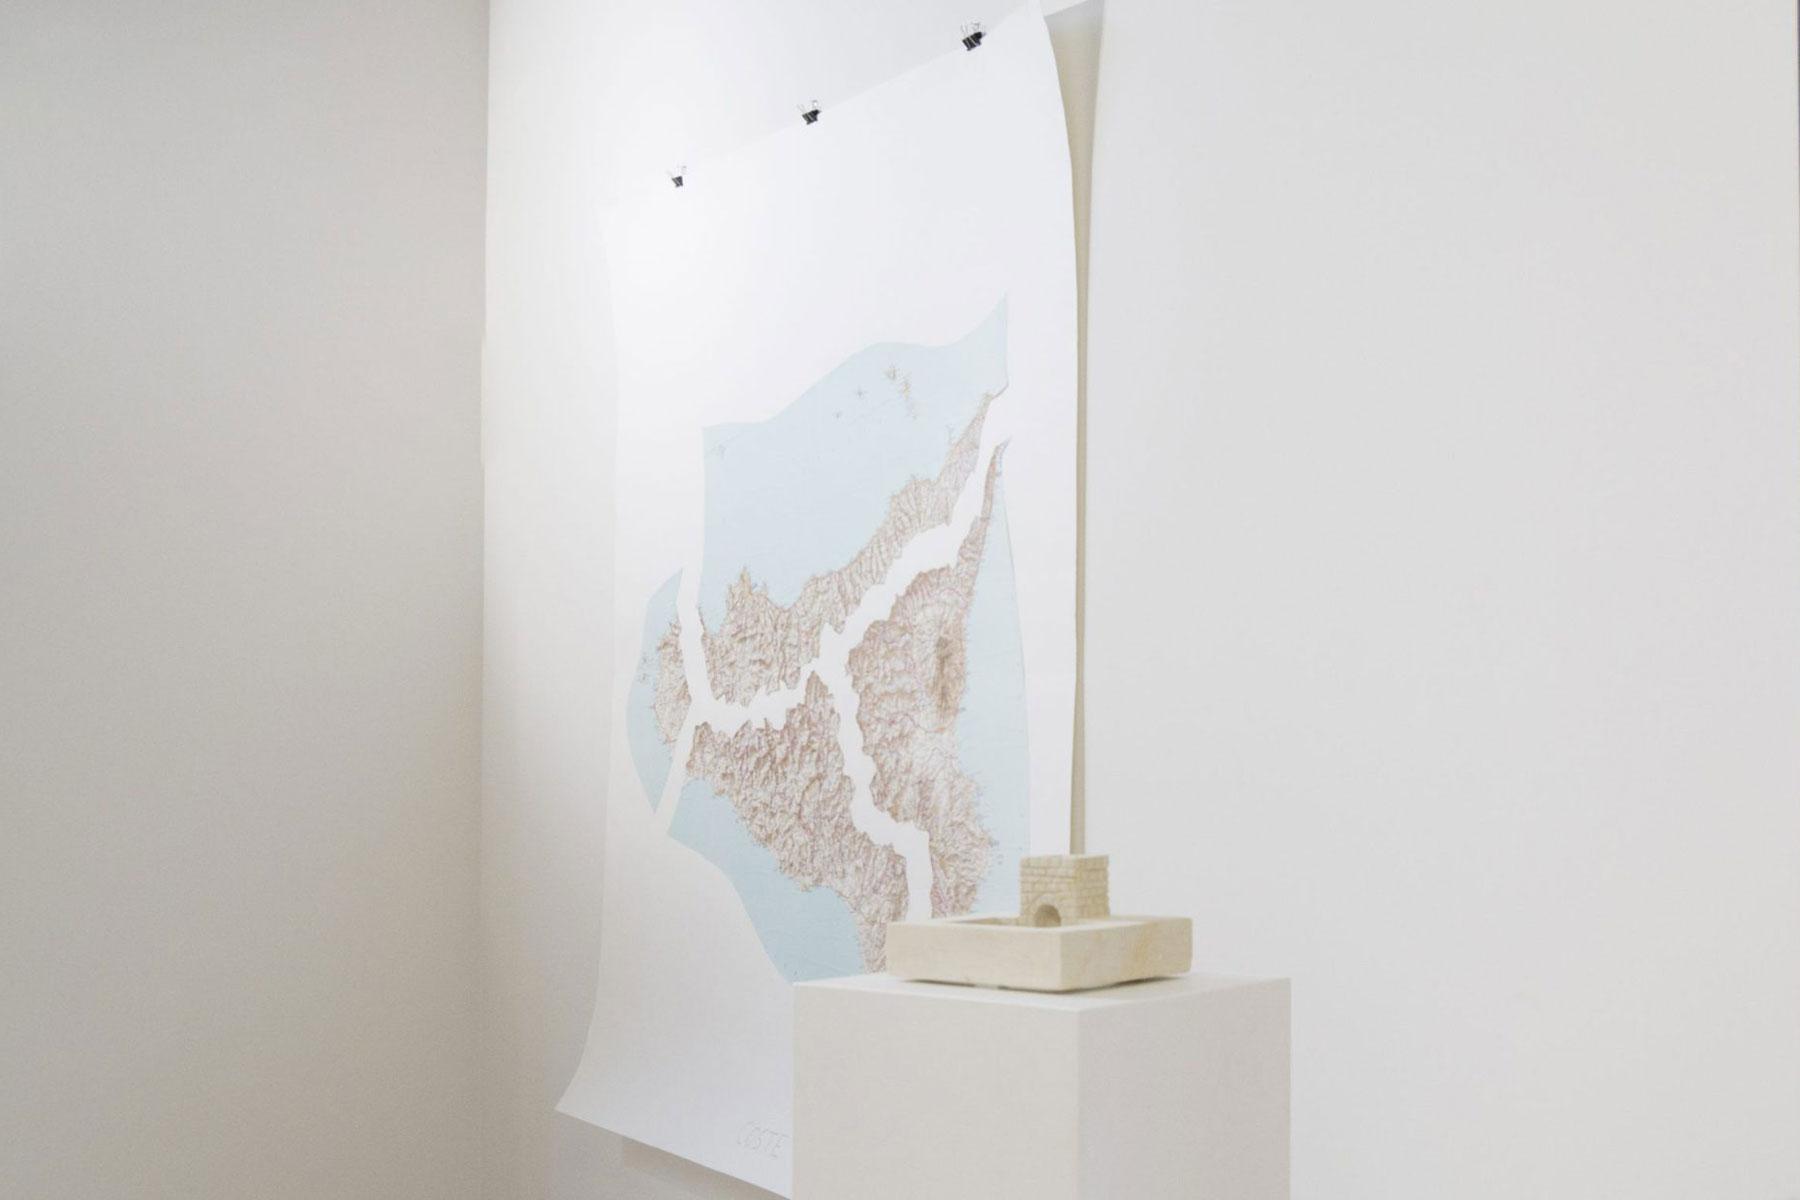 Exhibition: Fabrizio Bellomo - Peter Fend